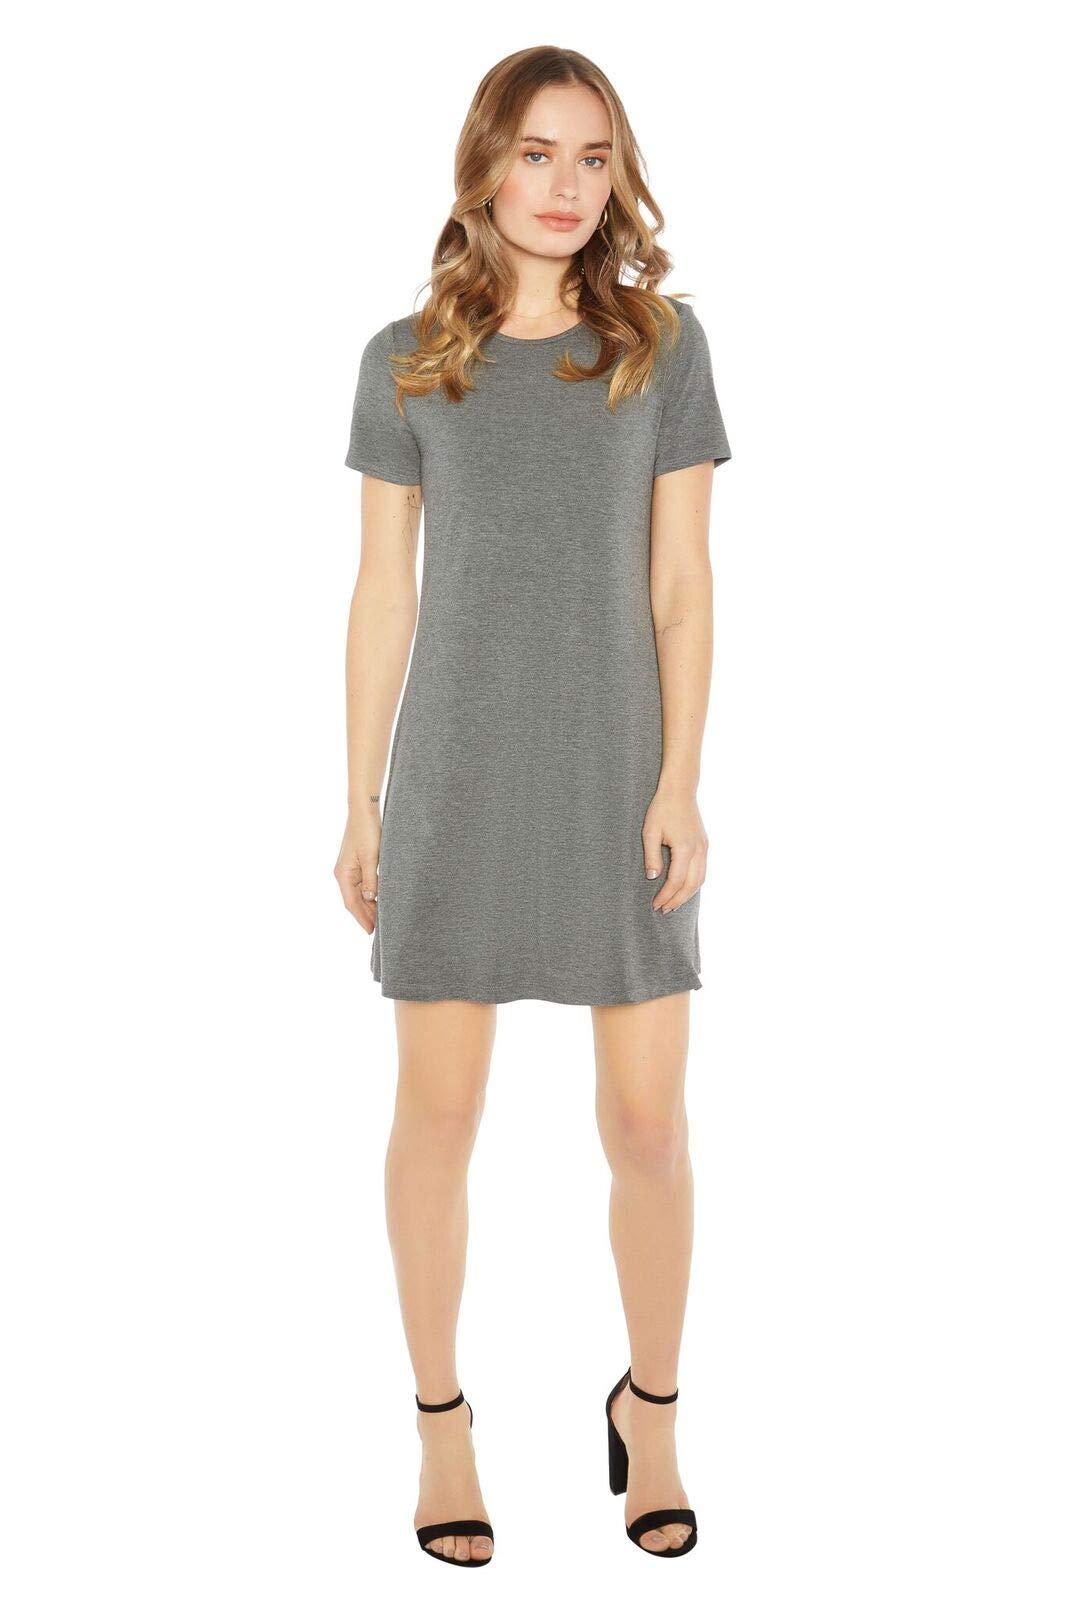 Rohb by Joyce Azria Cannes Short Sleeve Crew Neck Dress (Dark Heather Grey) Size M